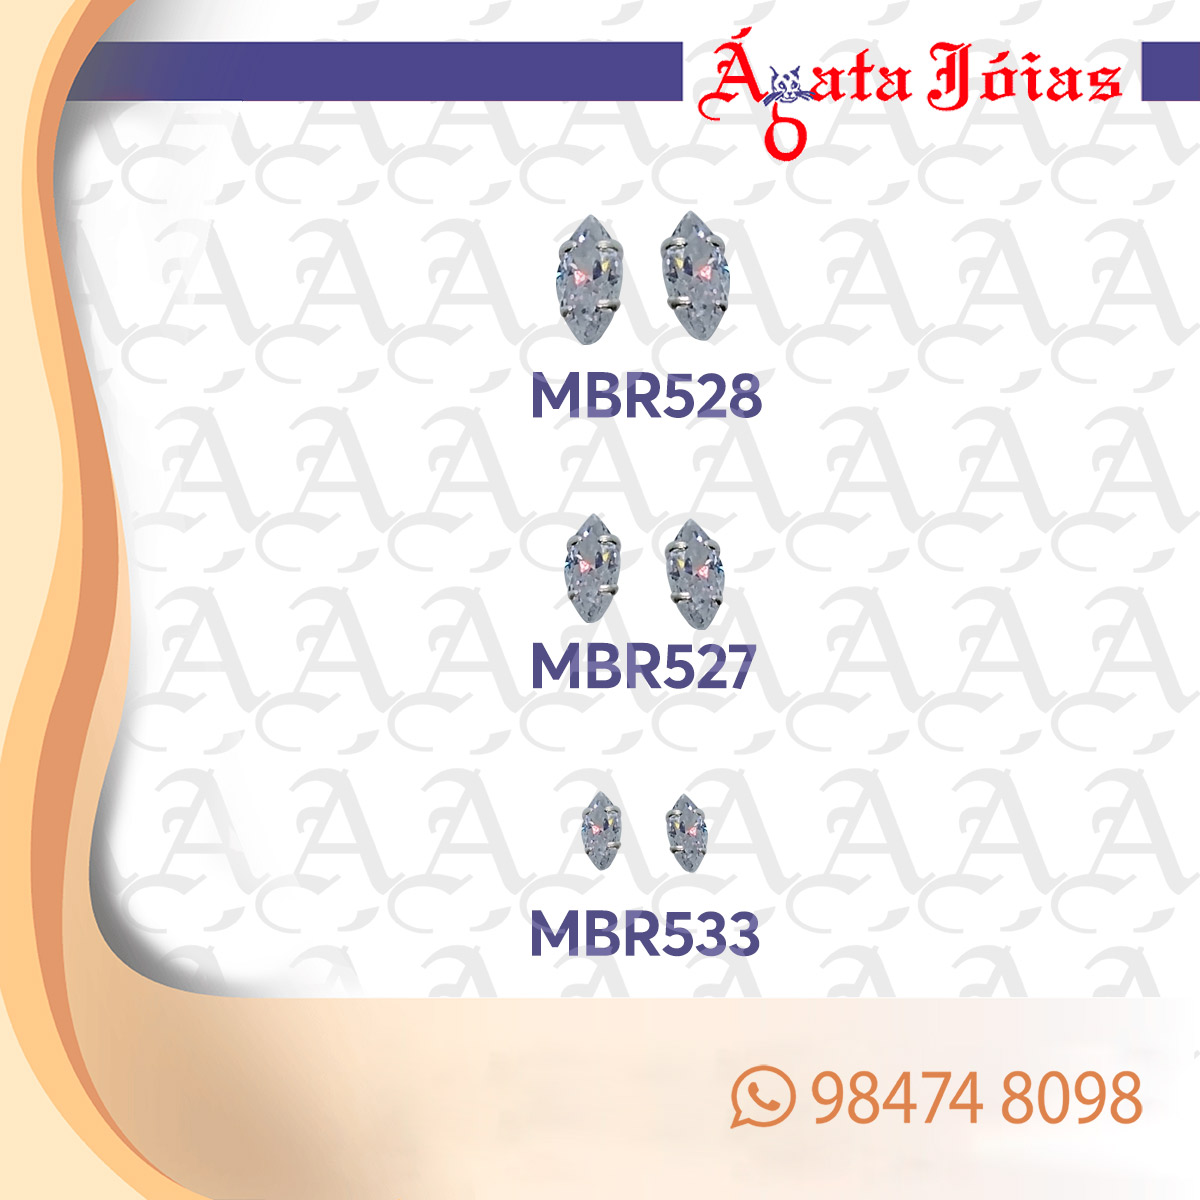 MBR527